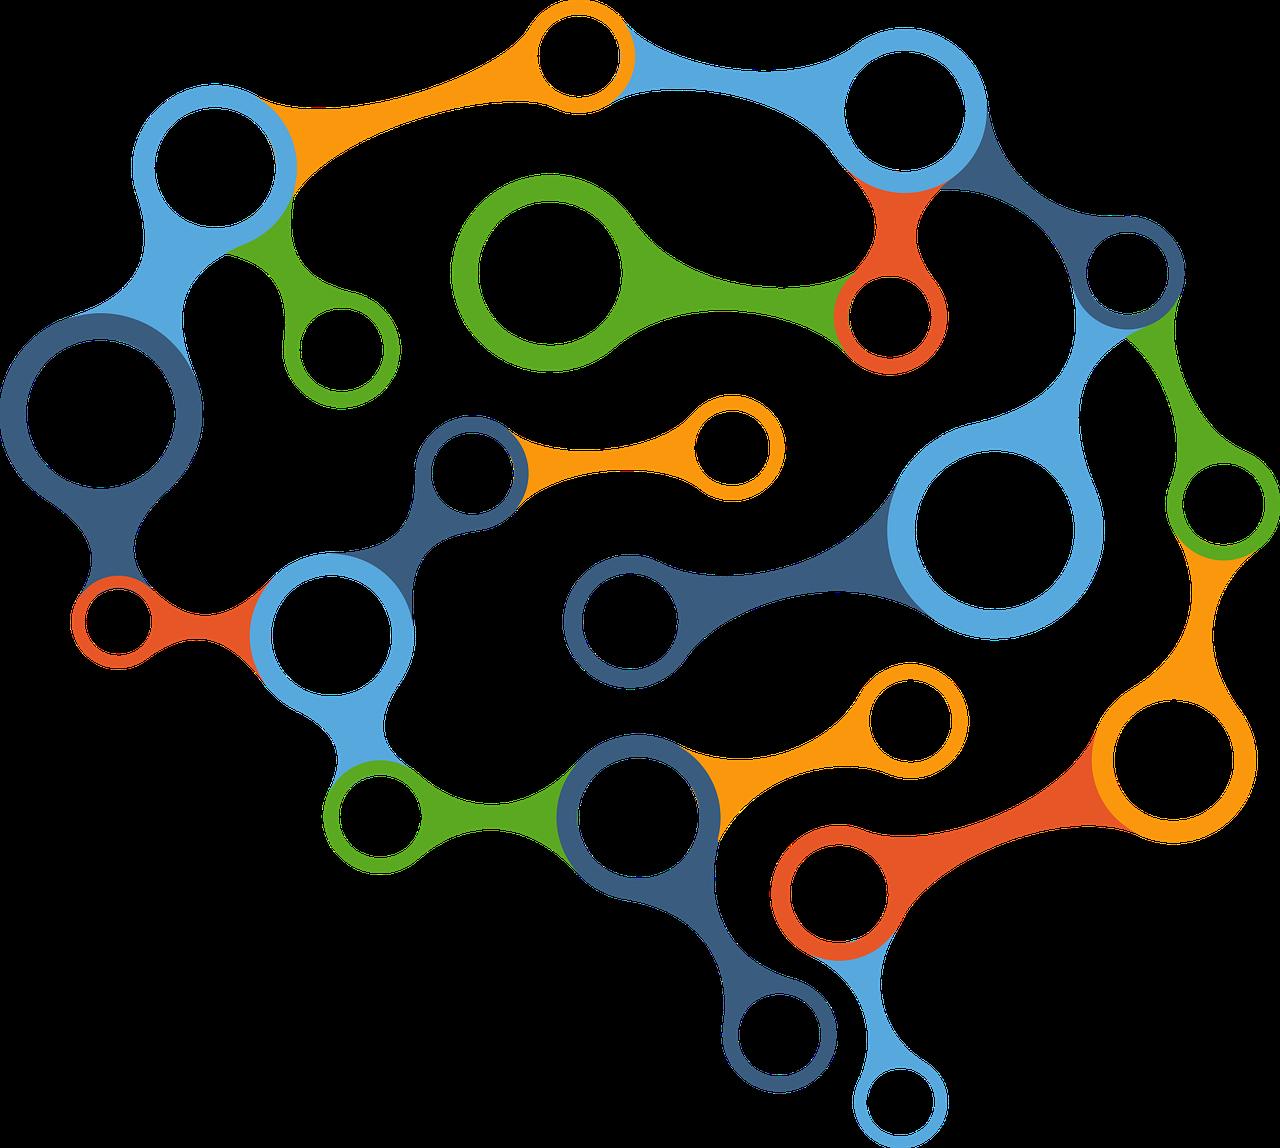 brain-cognition-design-art-2029391-1-1-1-1.jpg